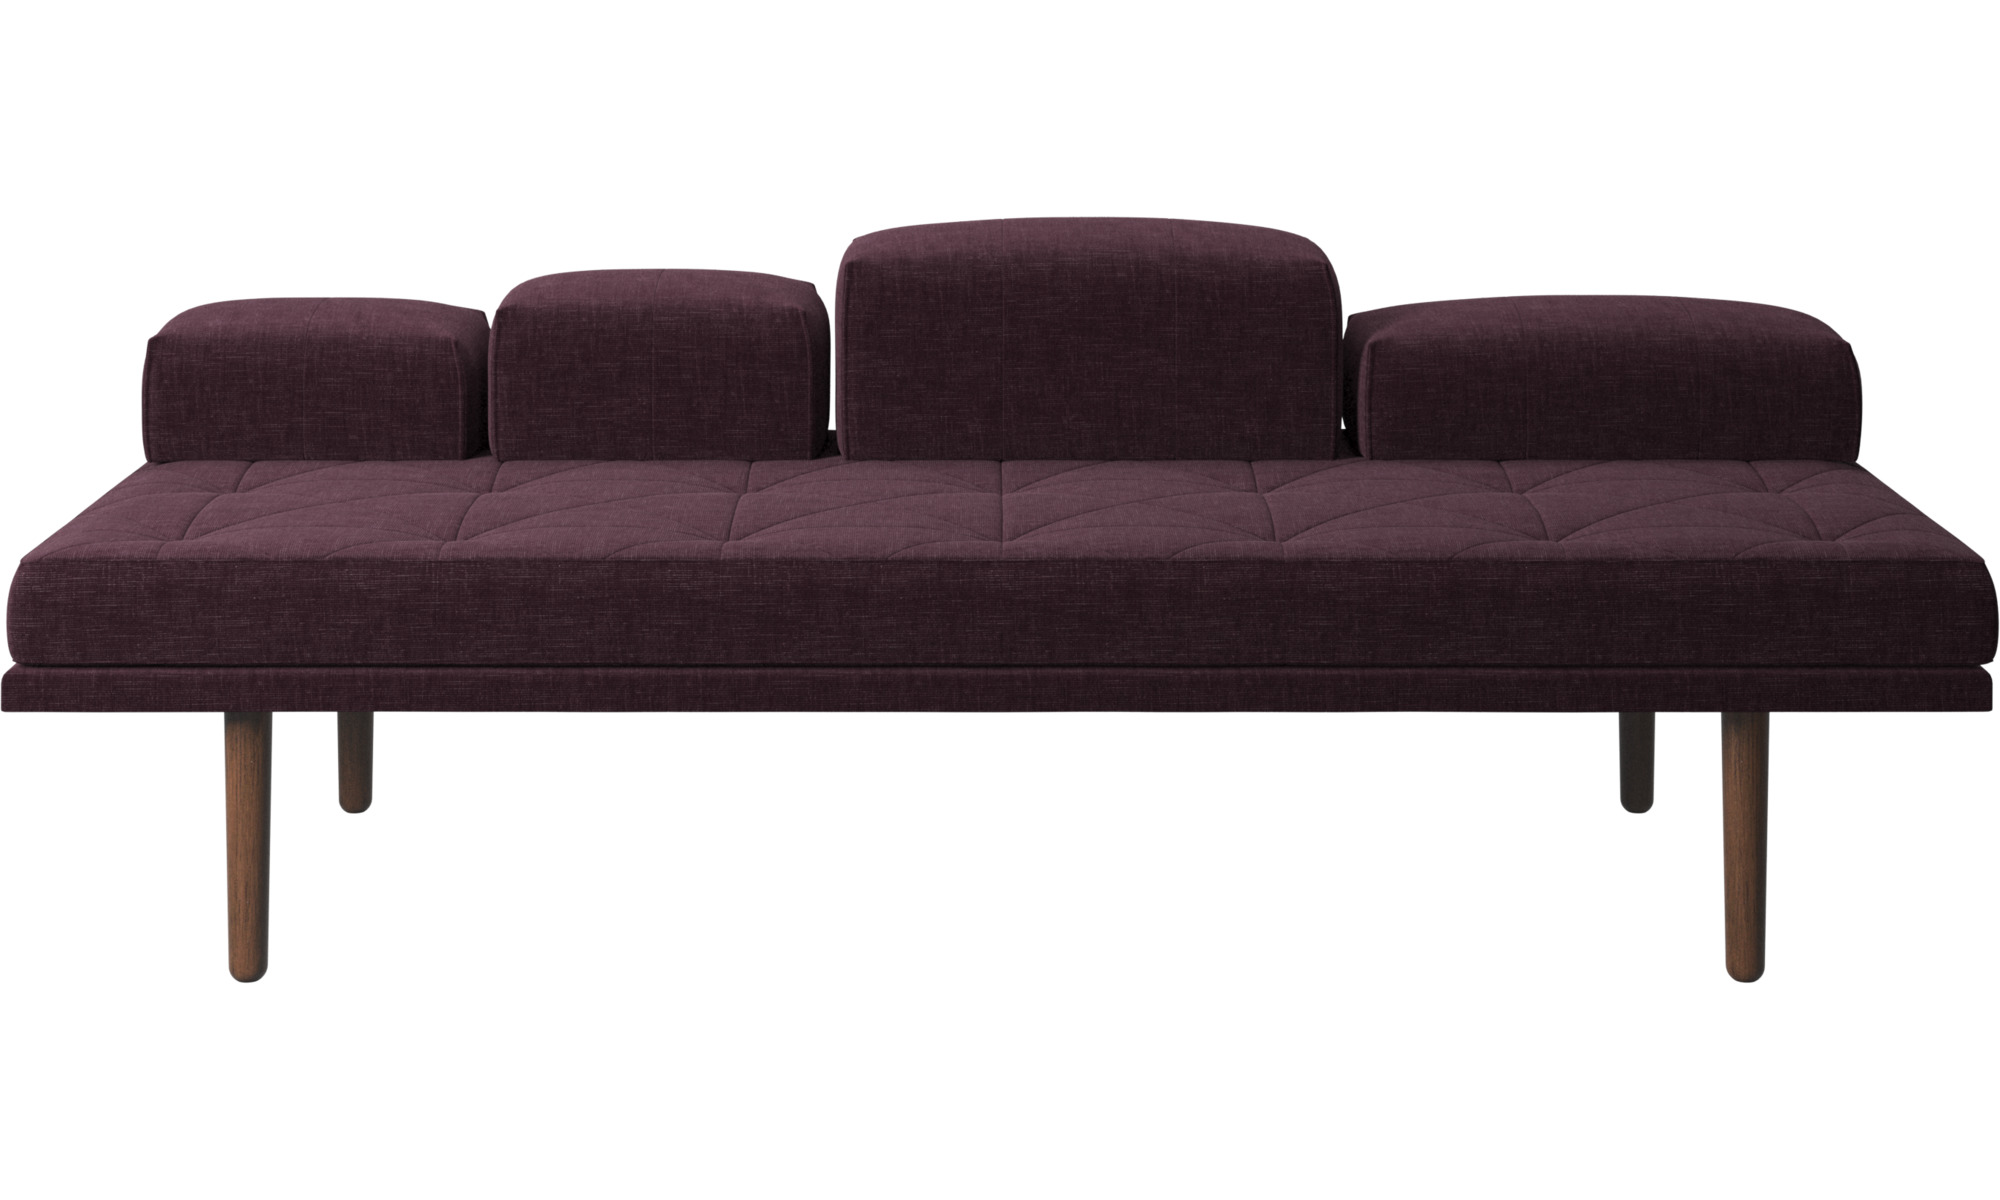 Daybeds - fusion divano letto - BoConcept